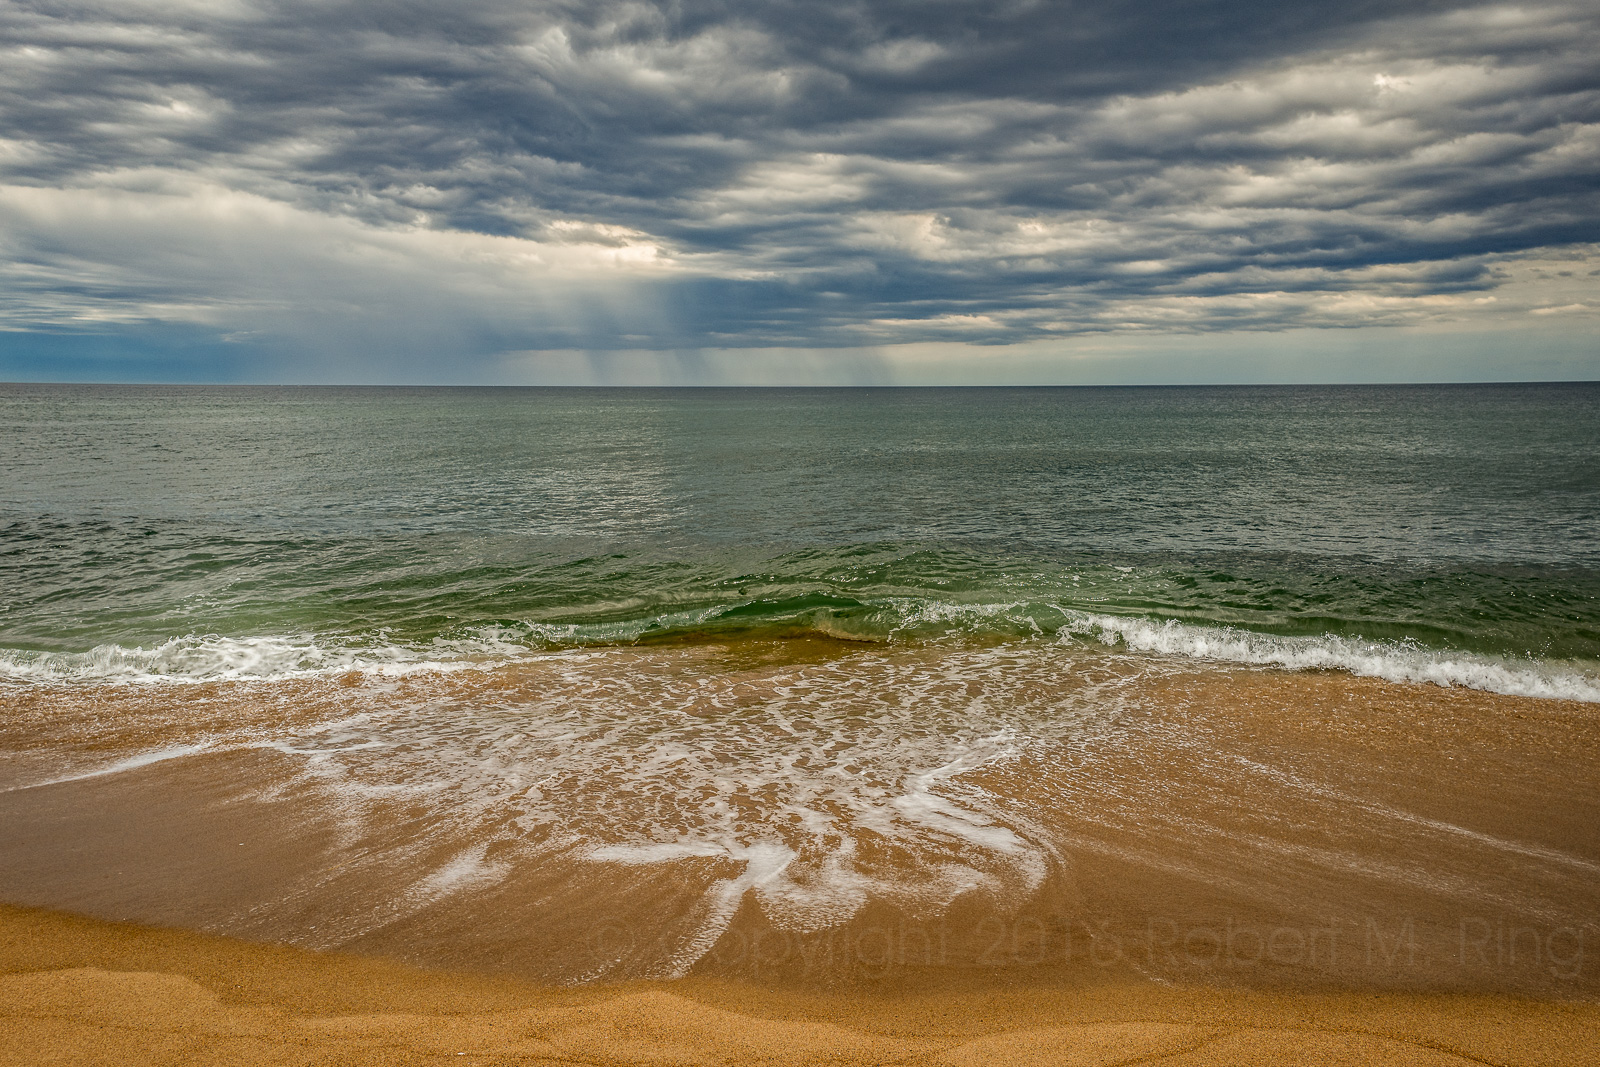 Clouds, Newburyport, New England, fine art, scenics, coast, massachusetts, beach